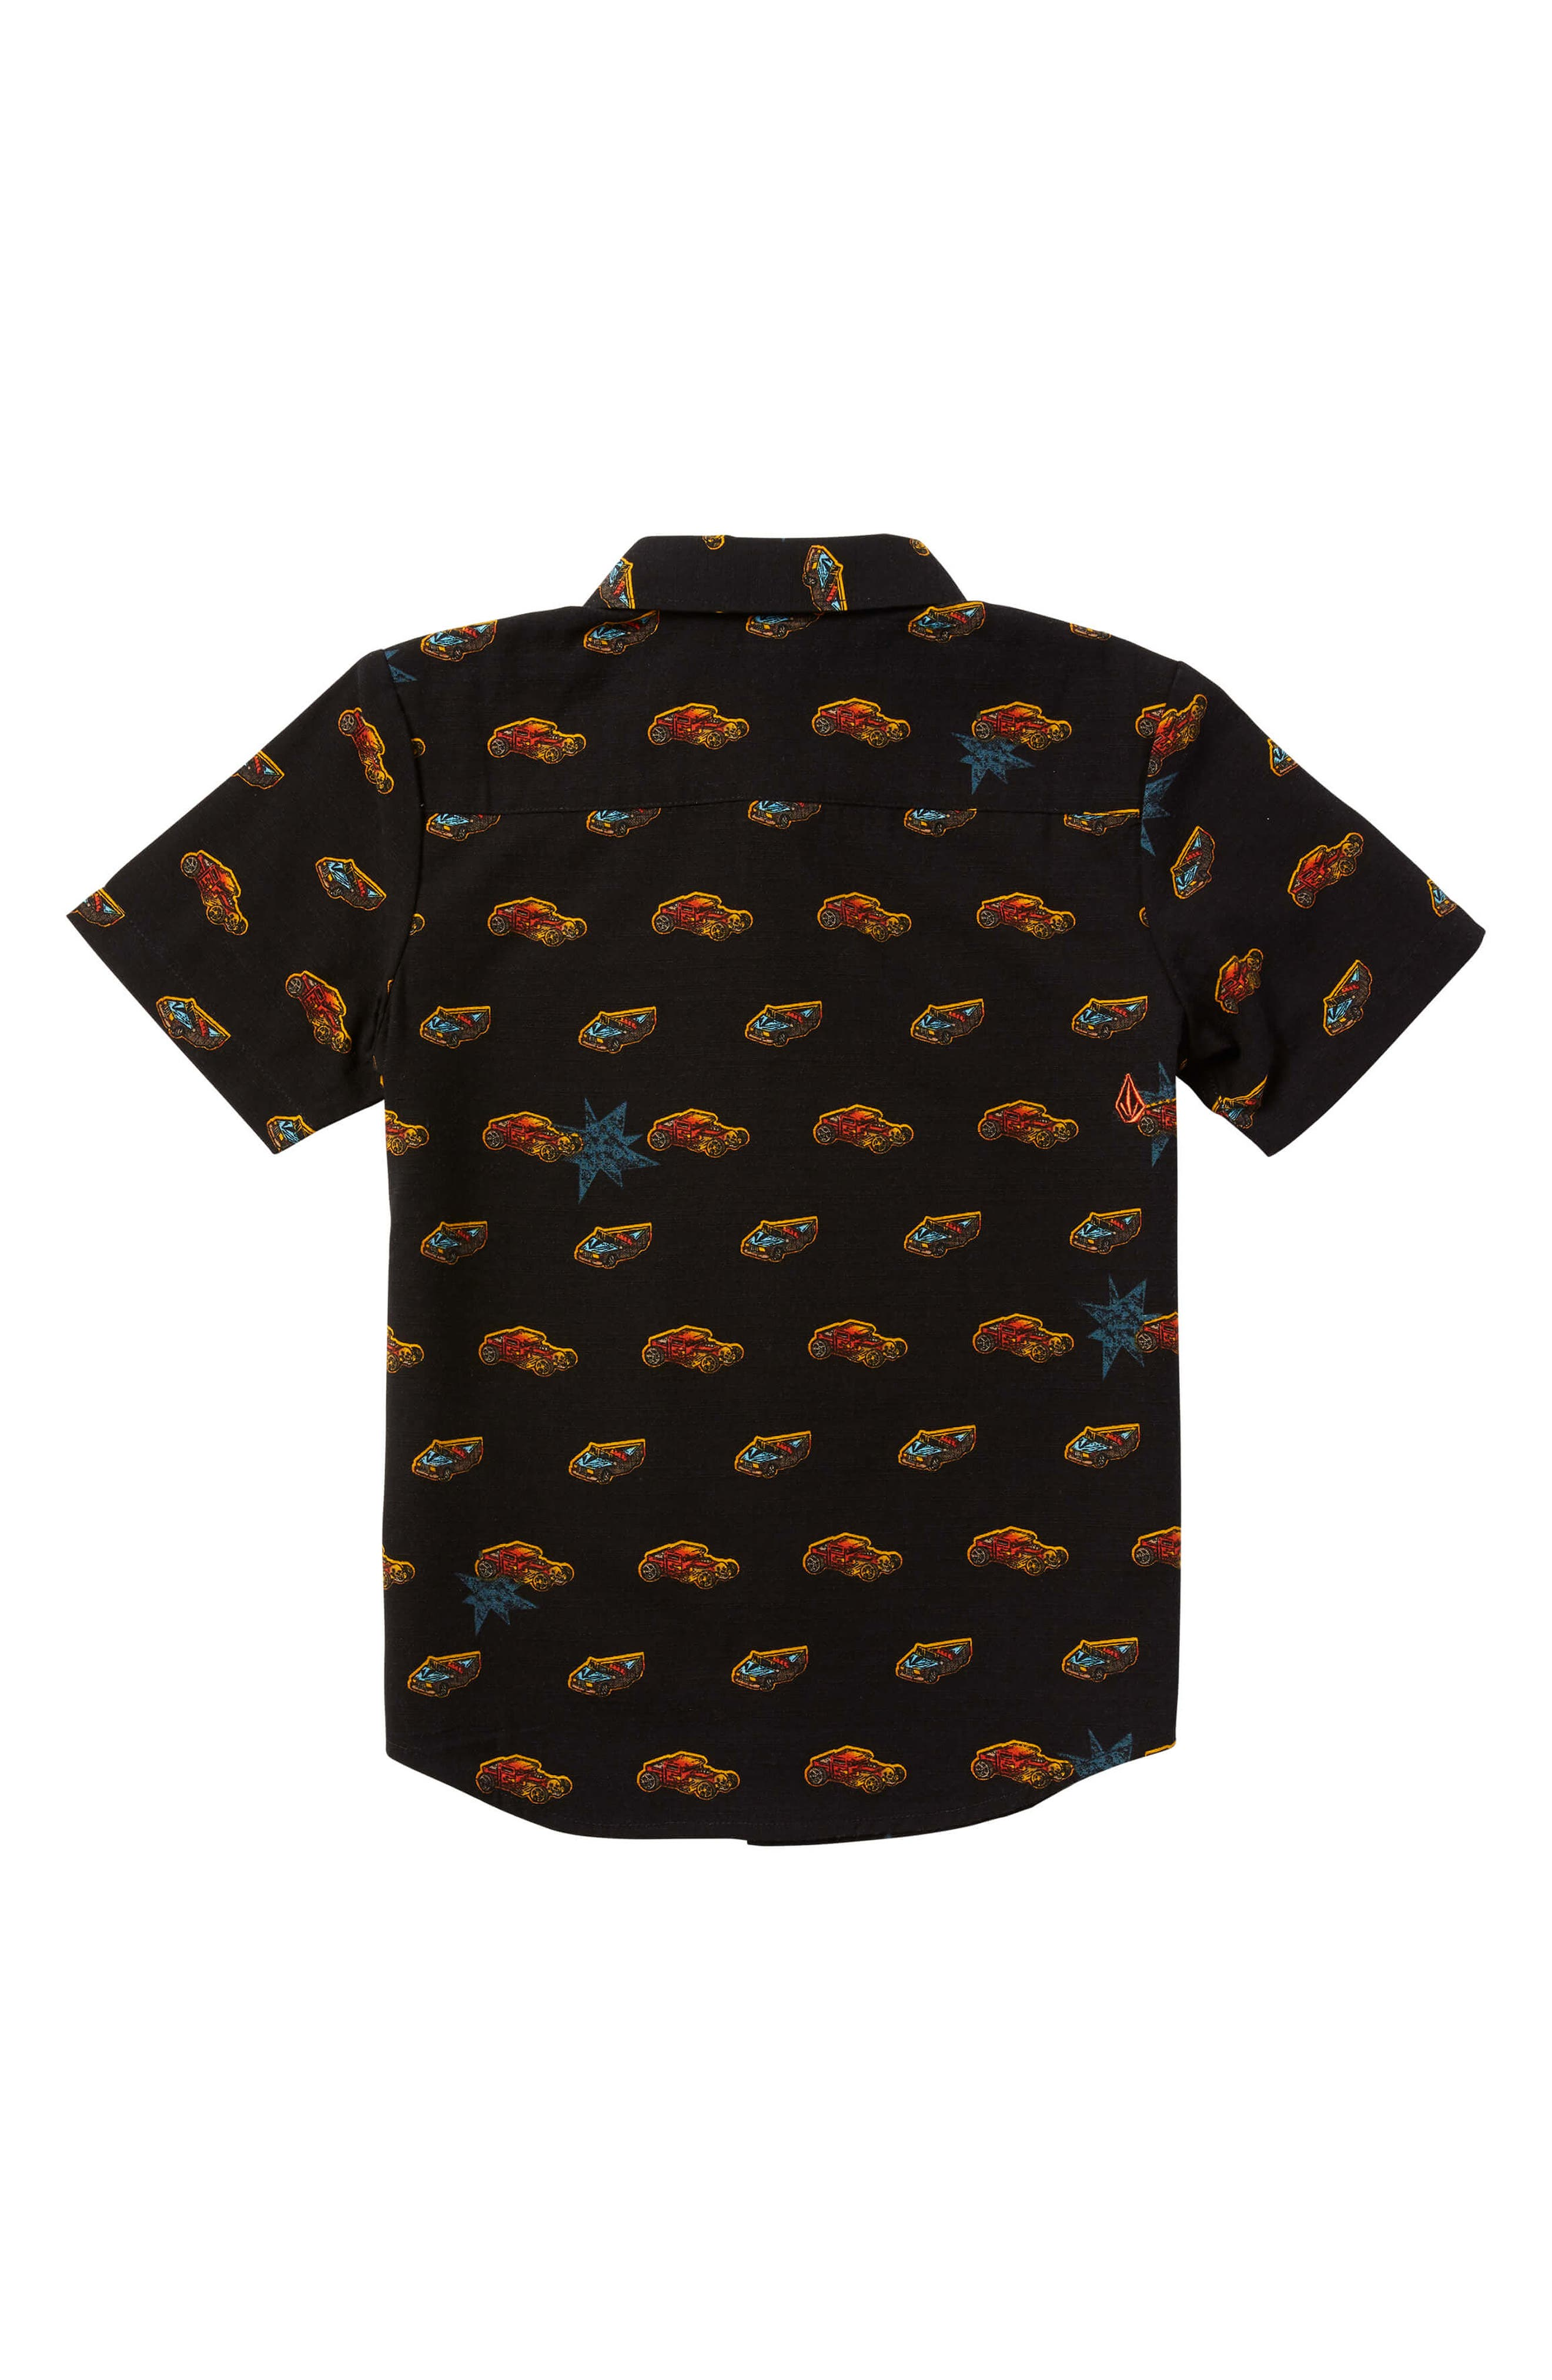 VOLCOM,                             x Hot Wheels<sup>®</sup> Woven Shirt,                             Alternate thumbnail 2, color,                             001